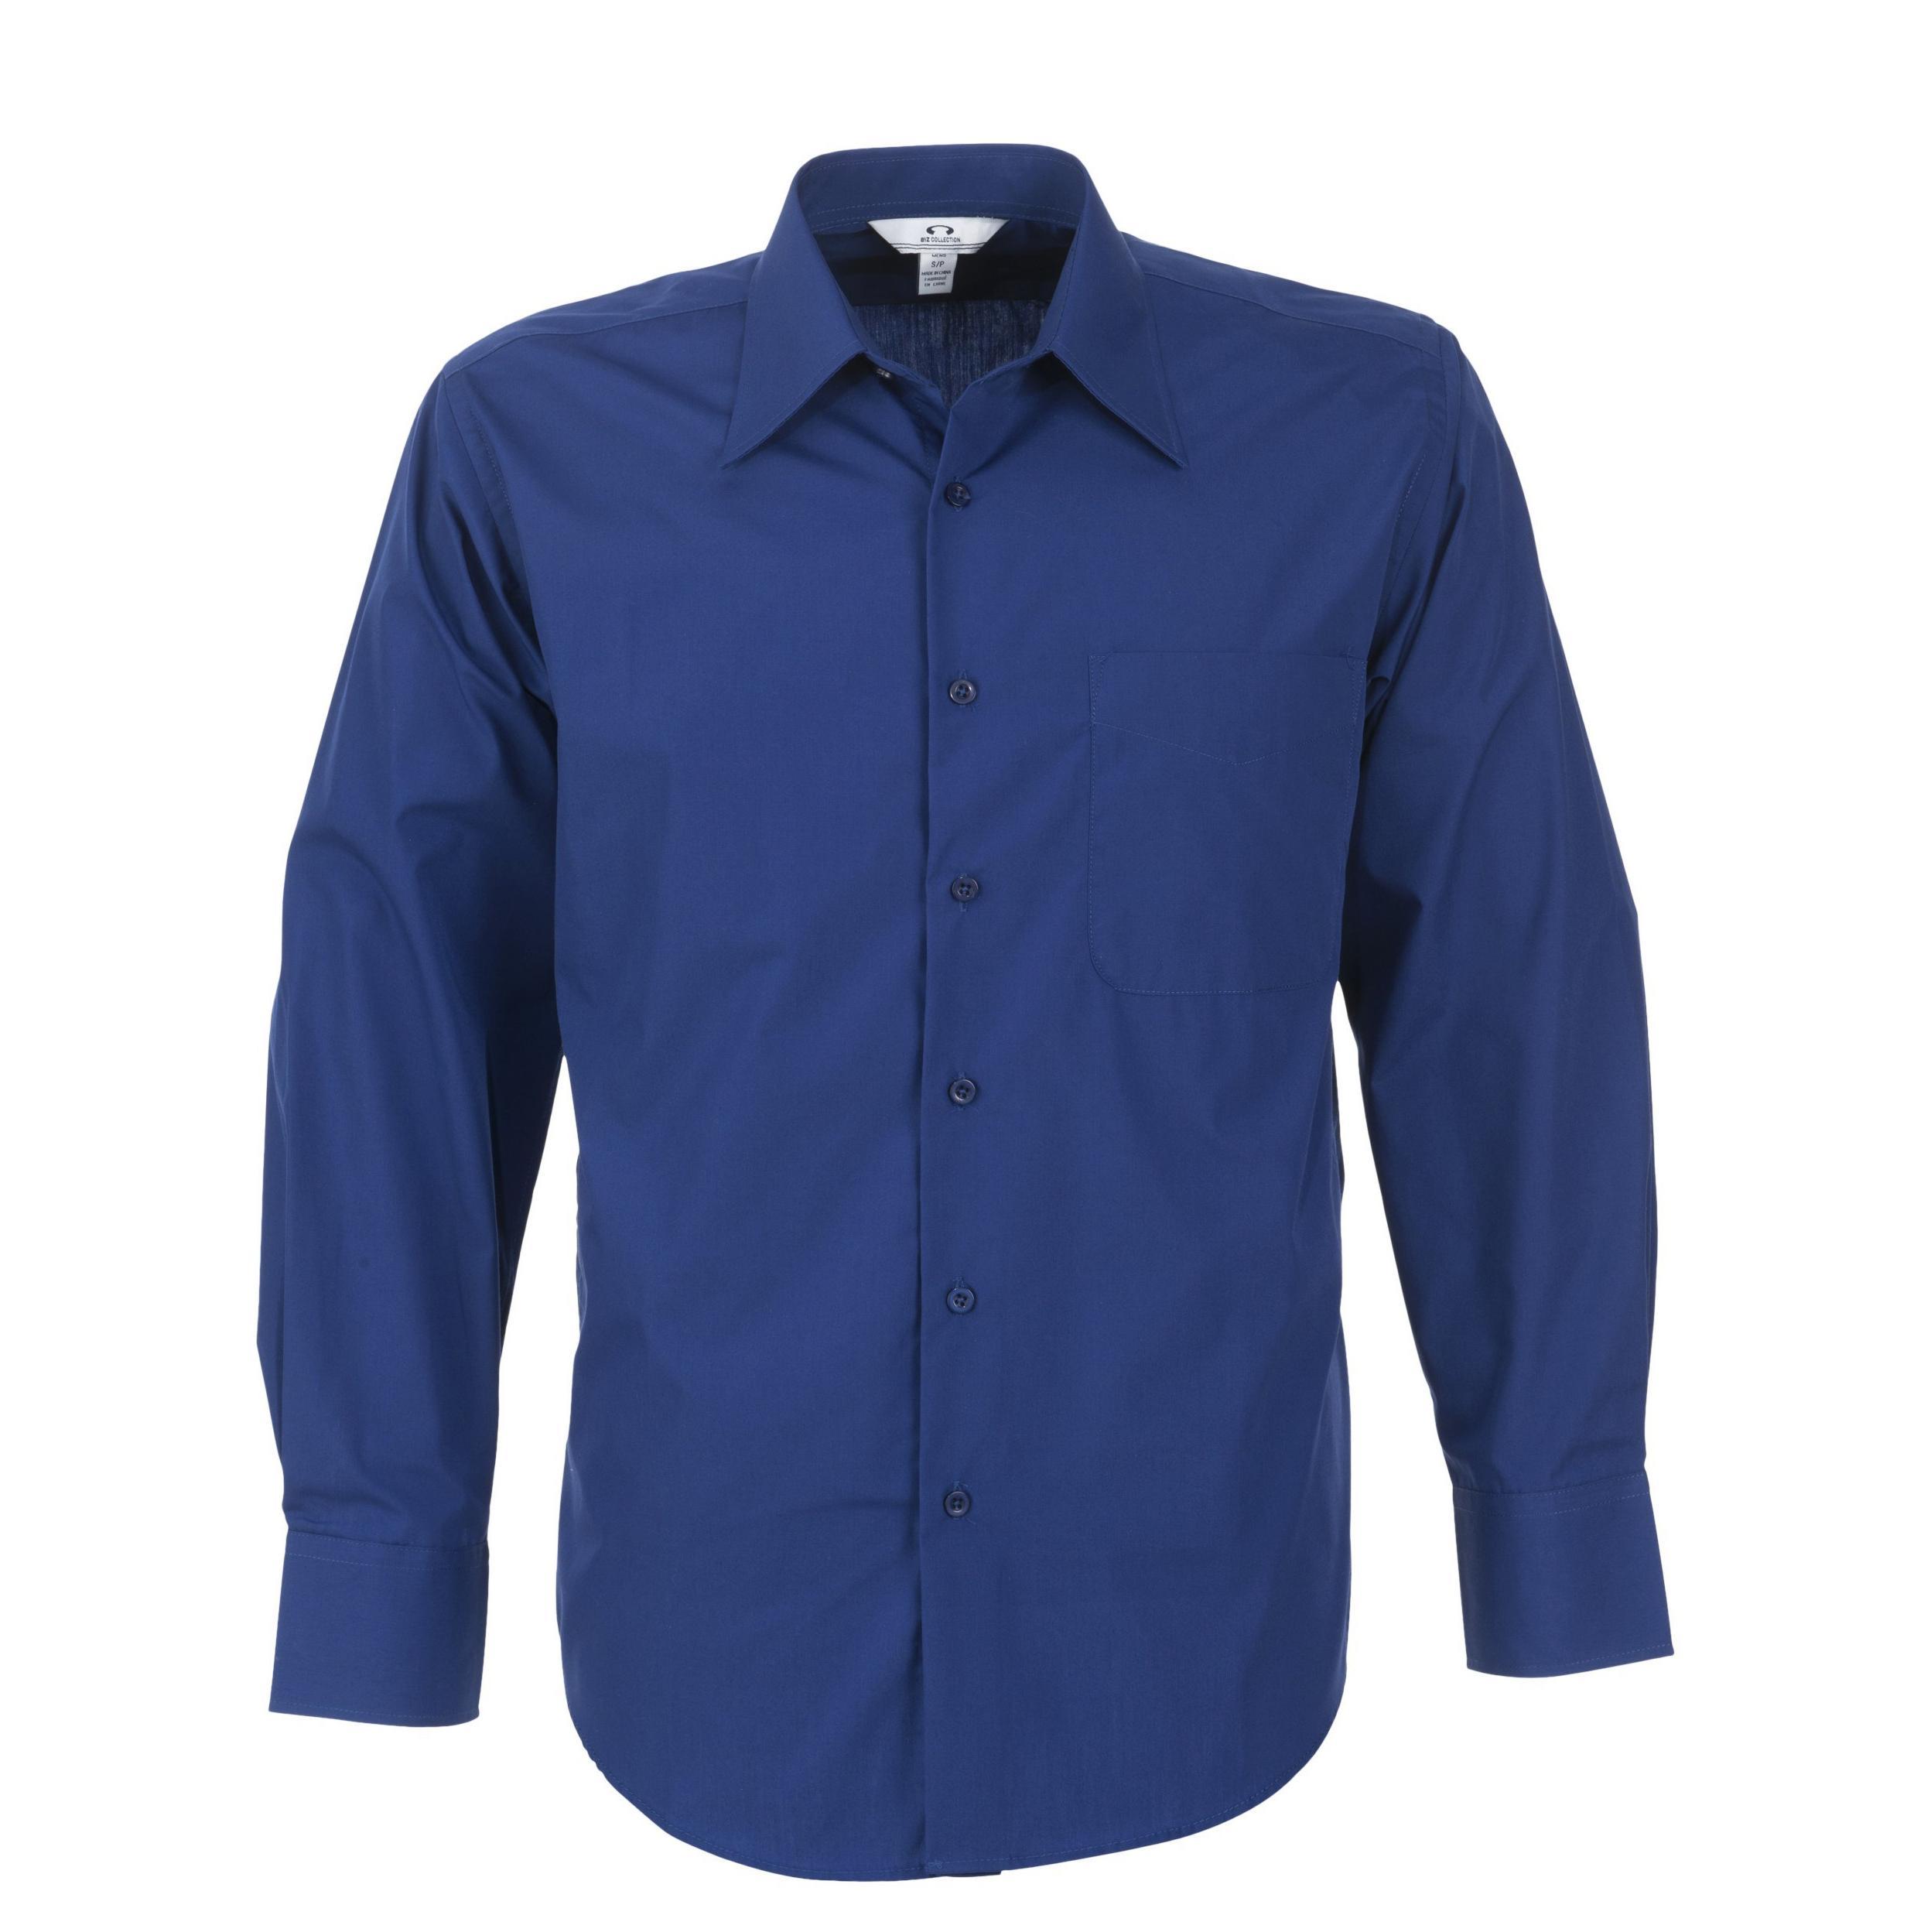 Mens Long Sleeve Metro Shirt - Royal Blue Only